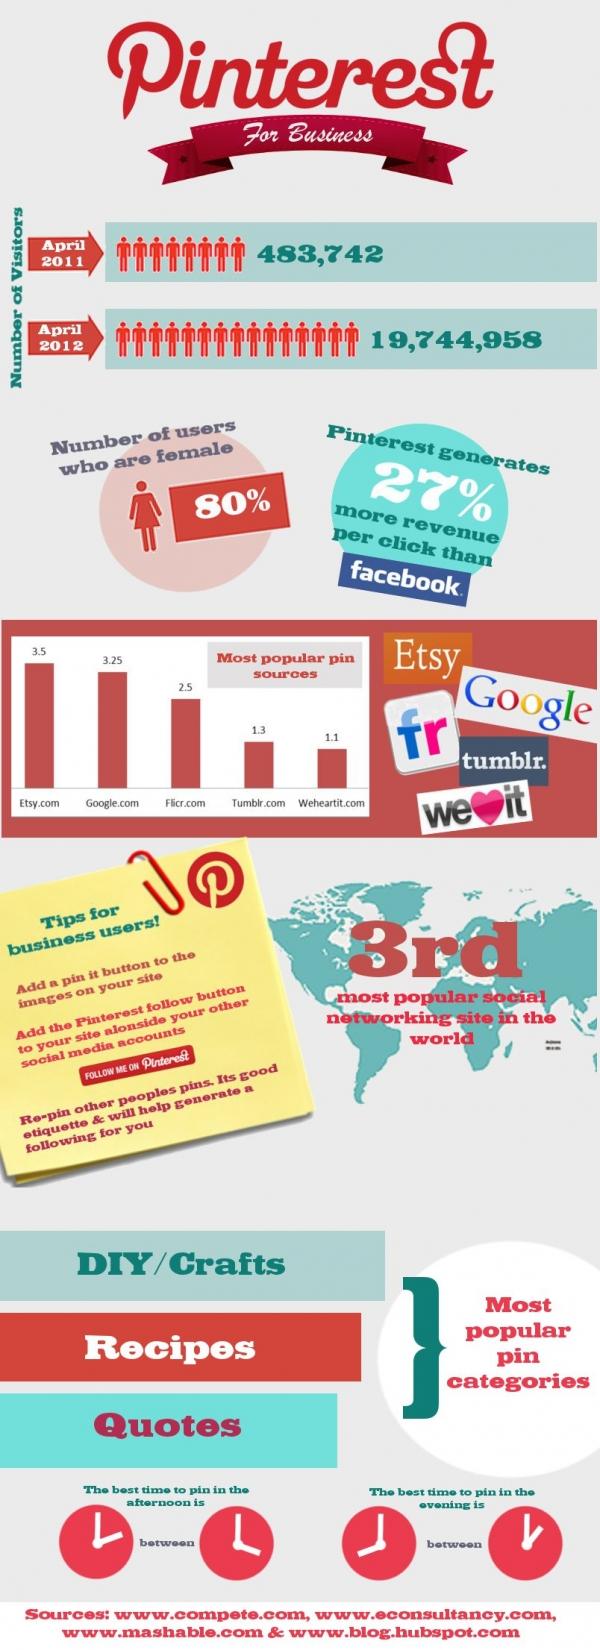 Pinterest Statistics Infographic | Imagine That Creative Marketing and PR